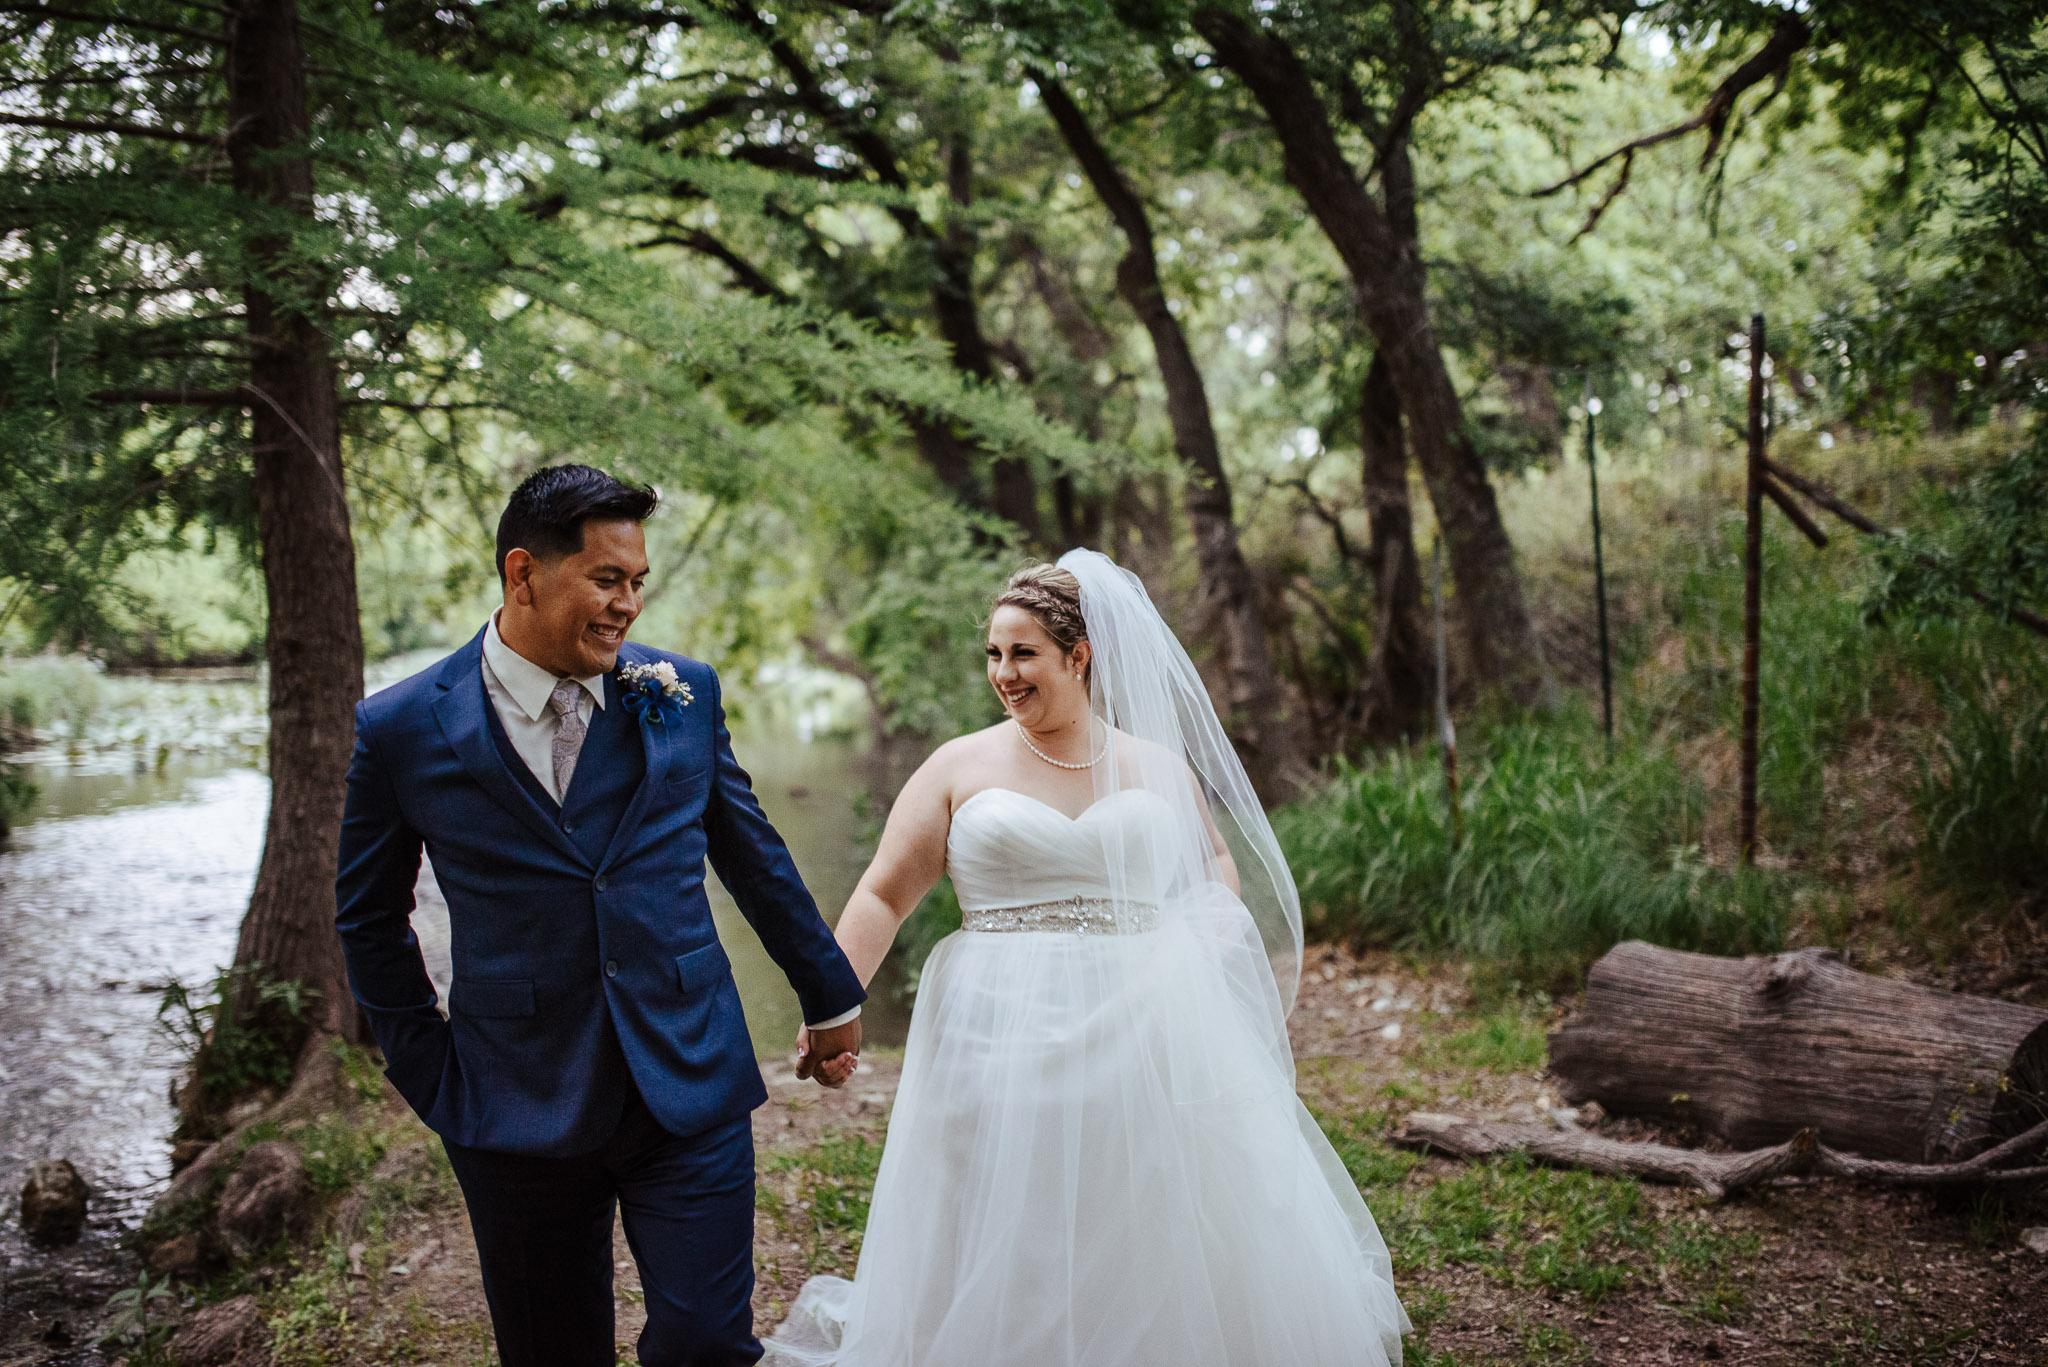 Christoval-Texas-Wedding_Photographer-Meghan&Tony-0030.jpg